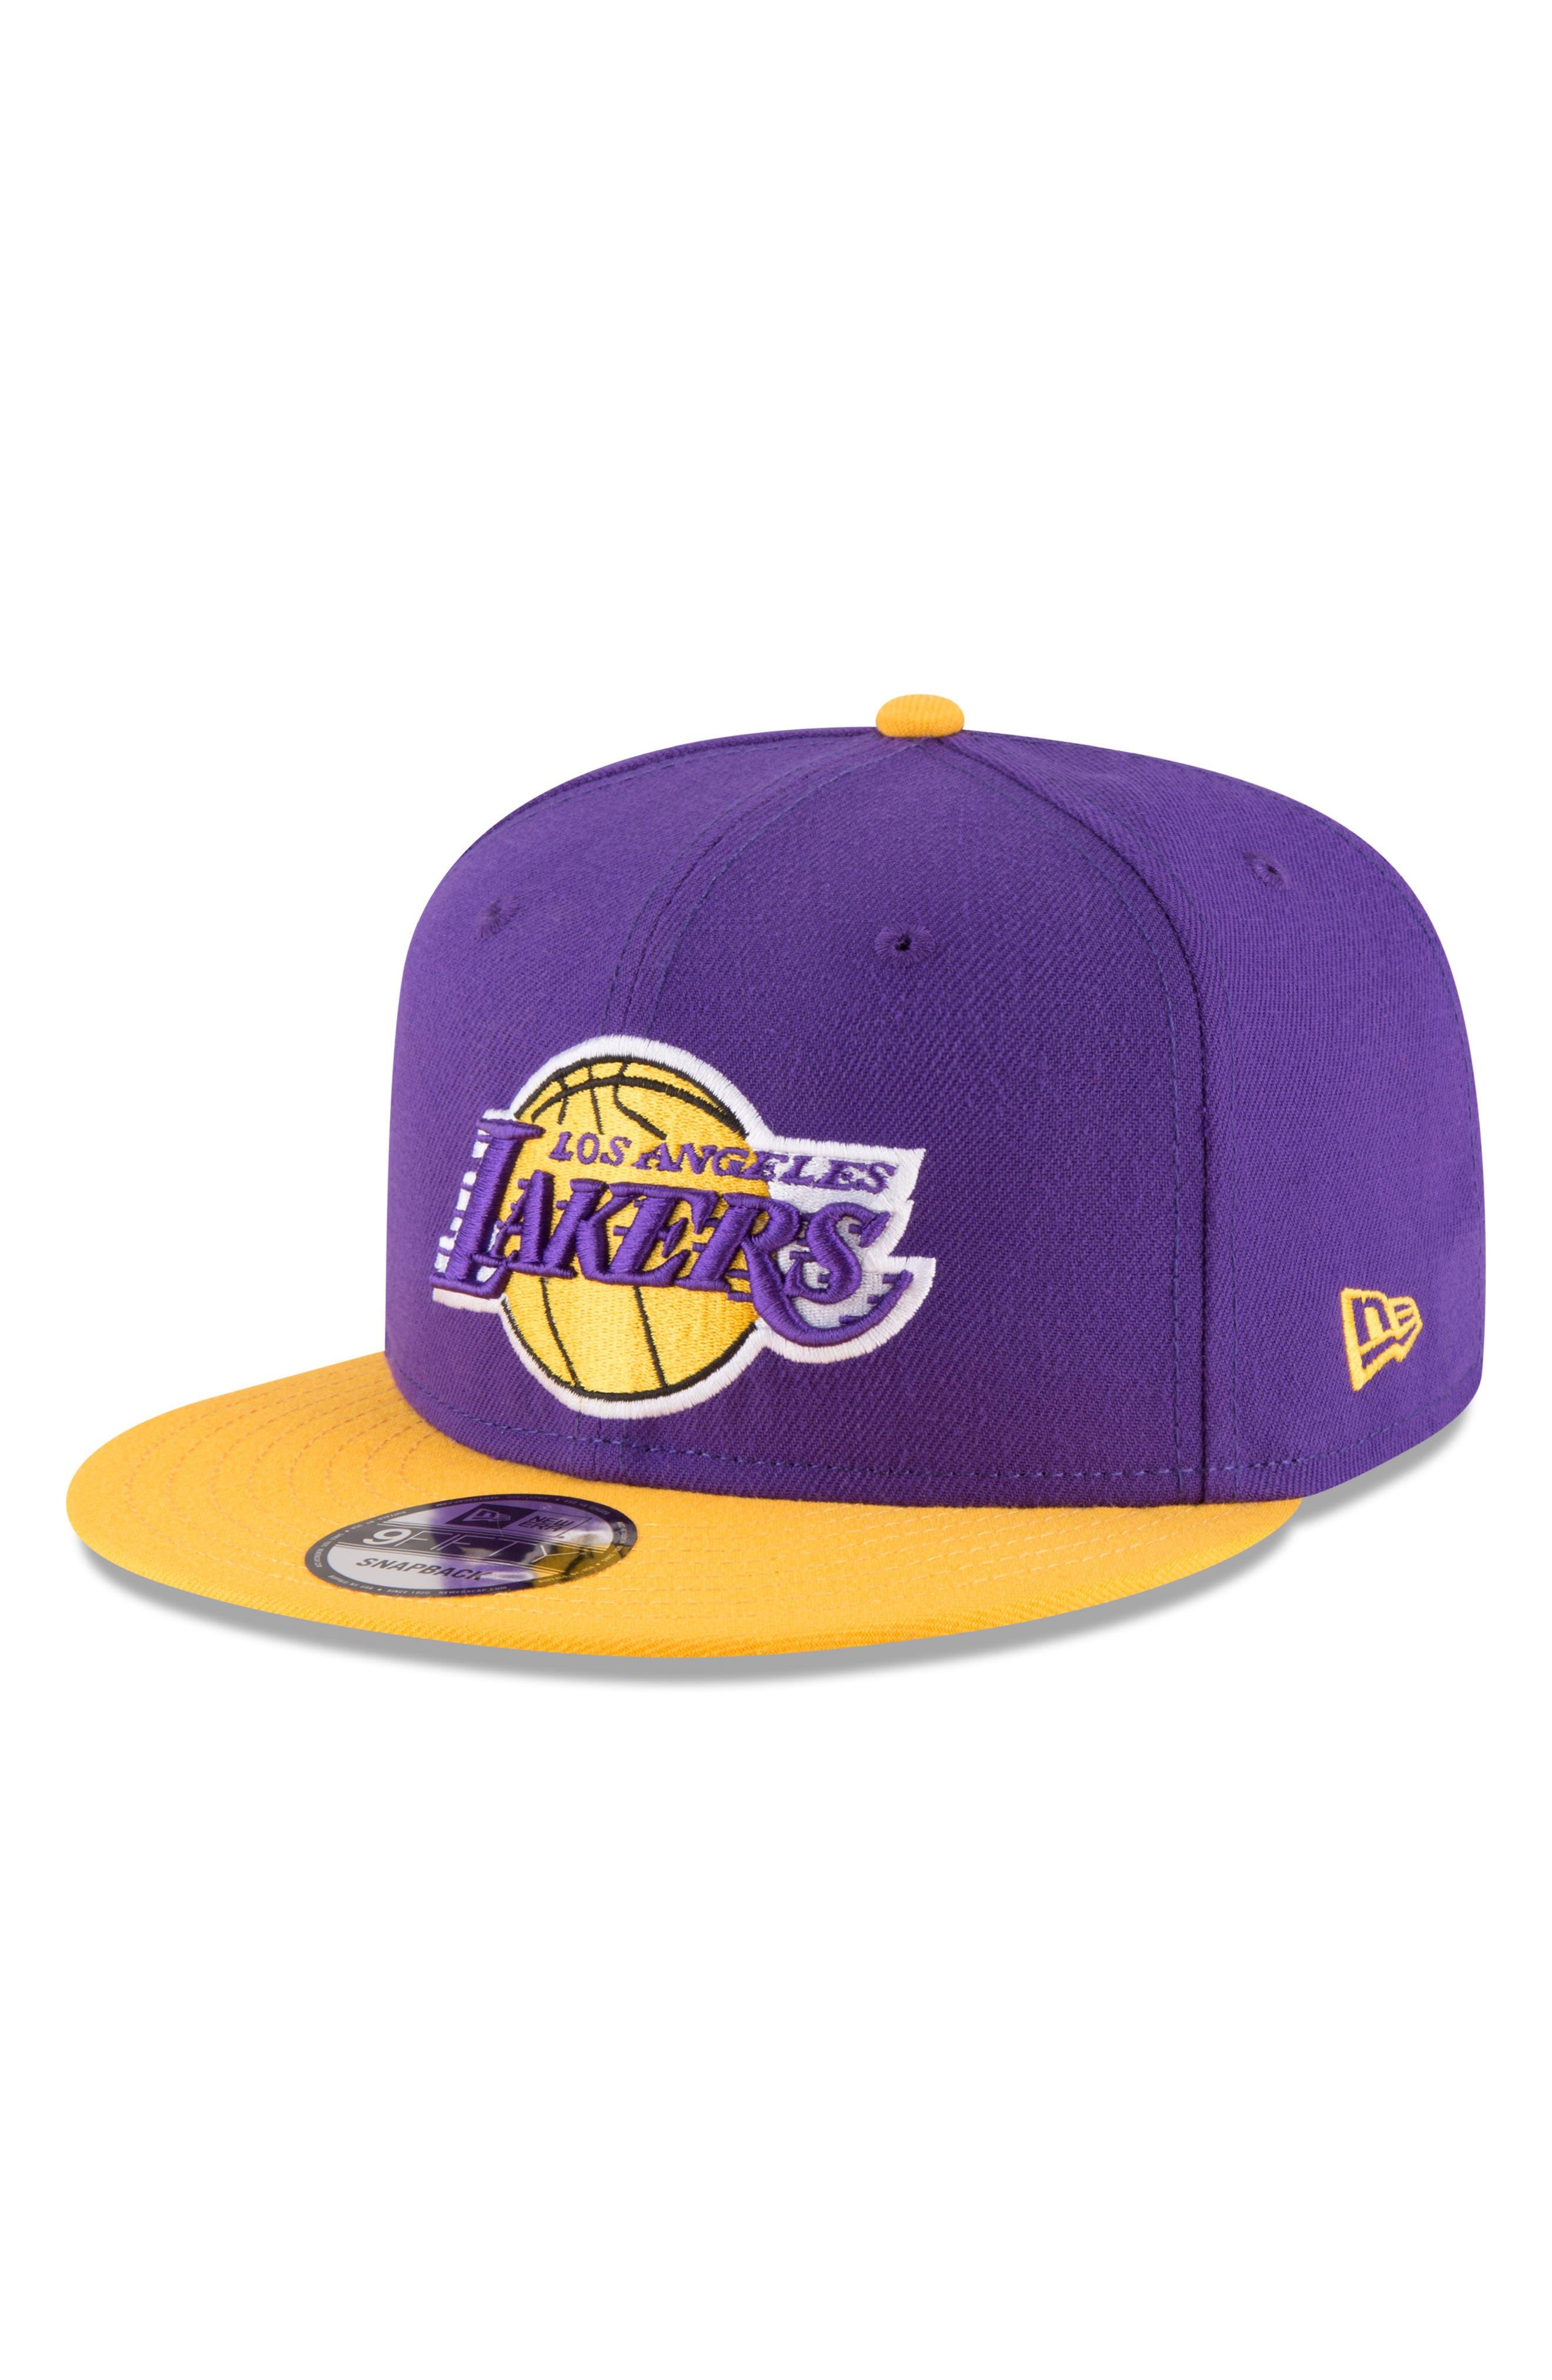 9FIFTY LA Lakers Two-Tone Cap,                         Main,                         color, PURPLE